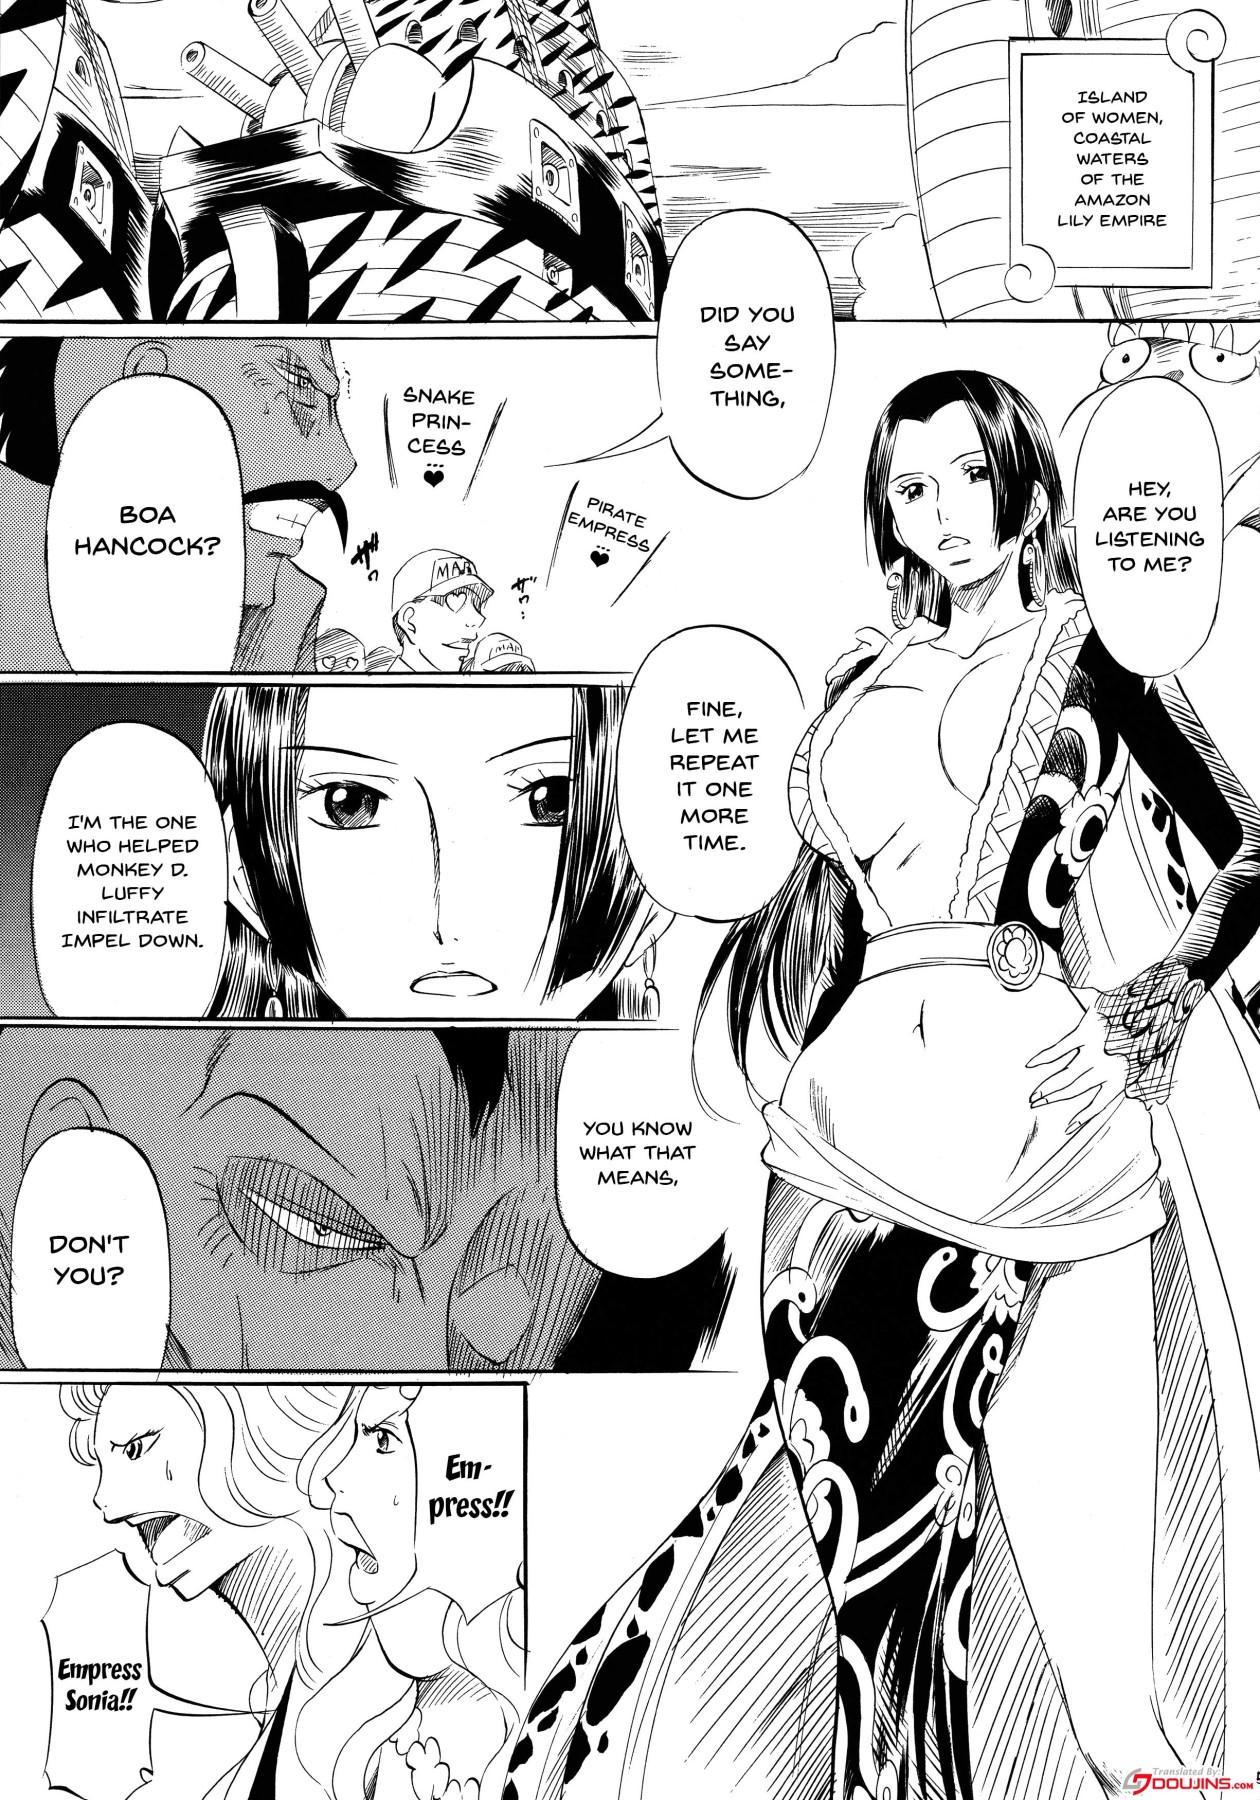 "[Busou Megami (Kannaduki Kanna)] Busou Megami Archives Series 1 ""Piece of Girl's ~Hancock Hen~"" (One Piece) [English] {Doujins.com} 3"